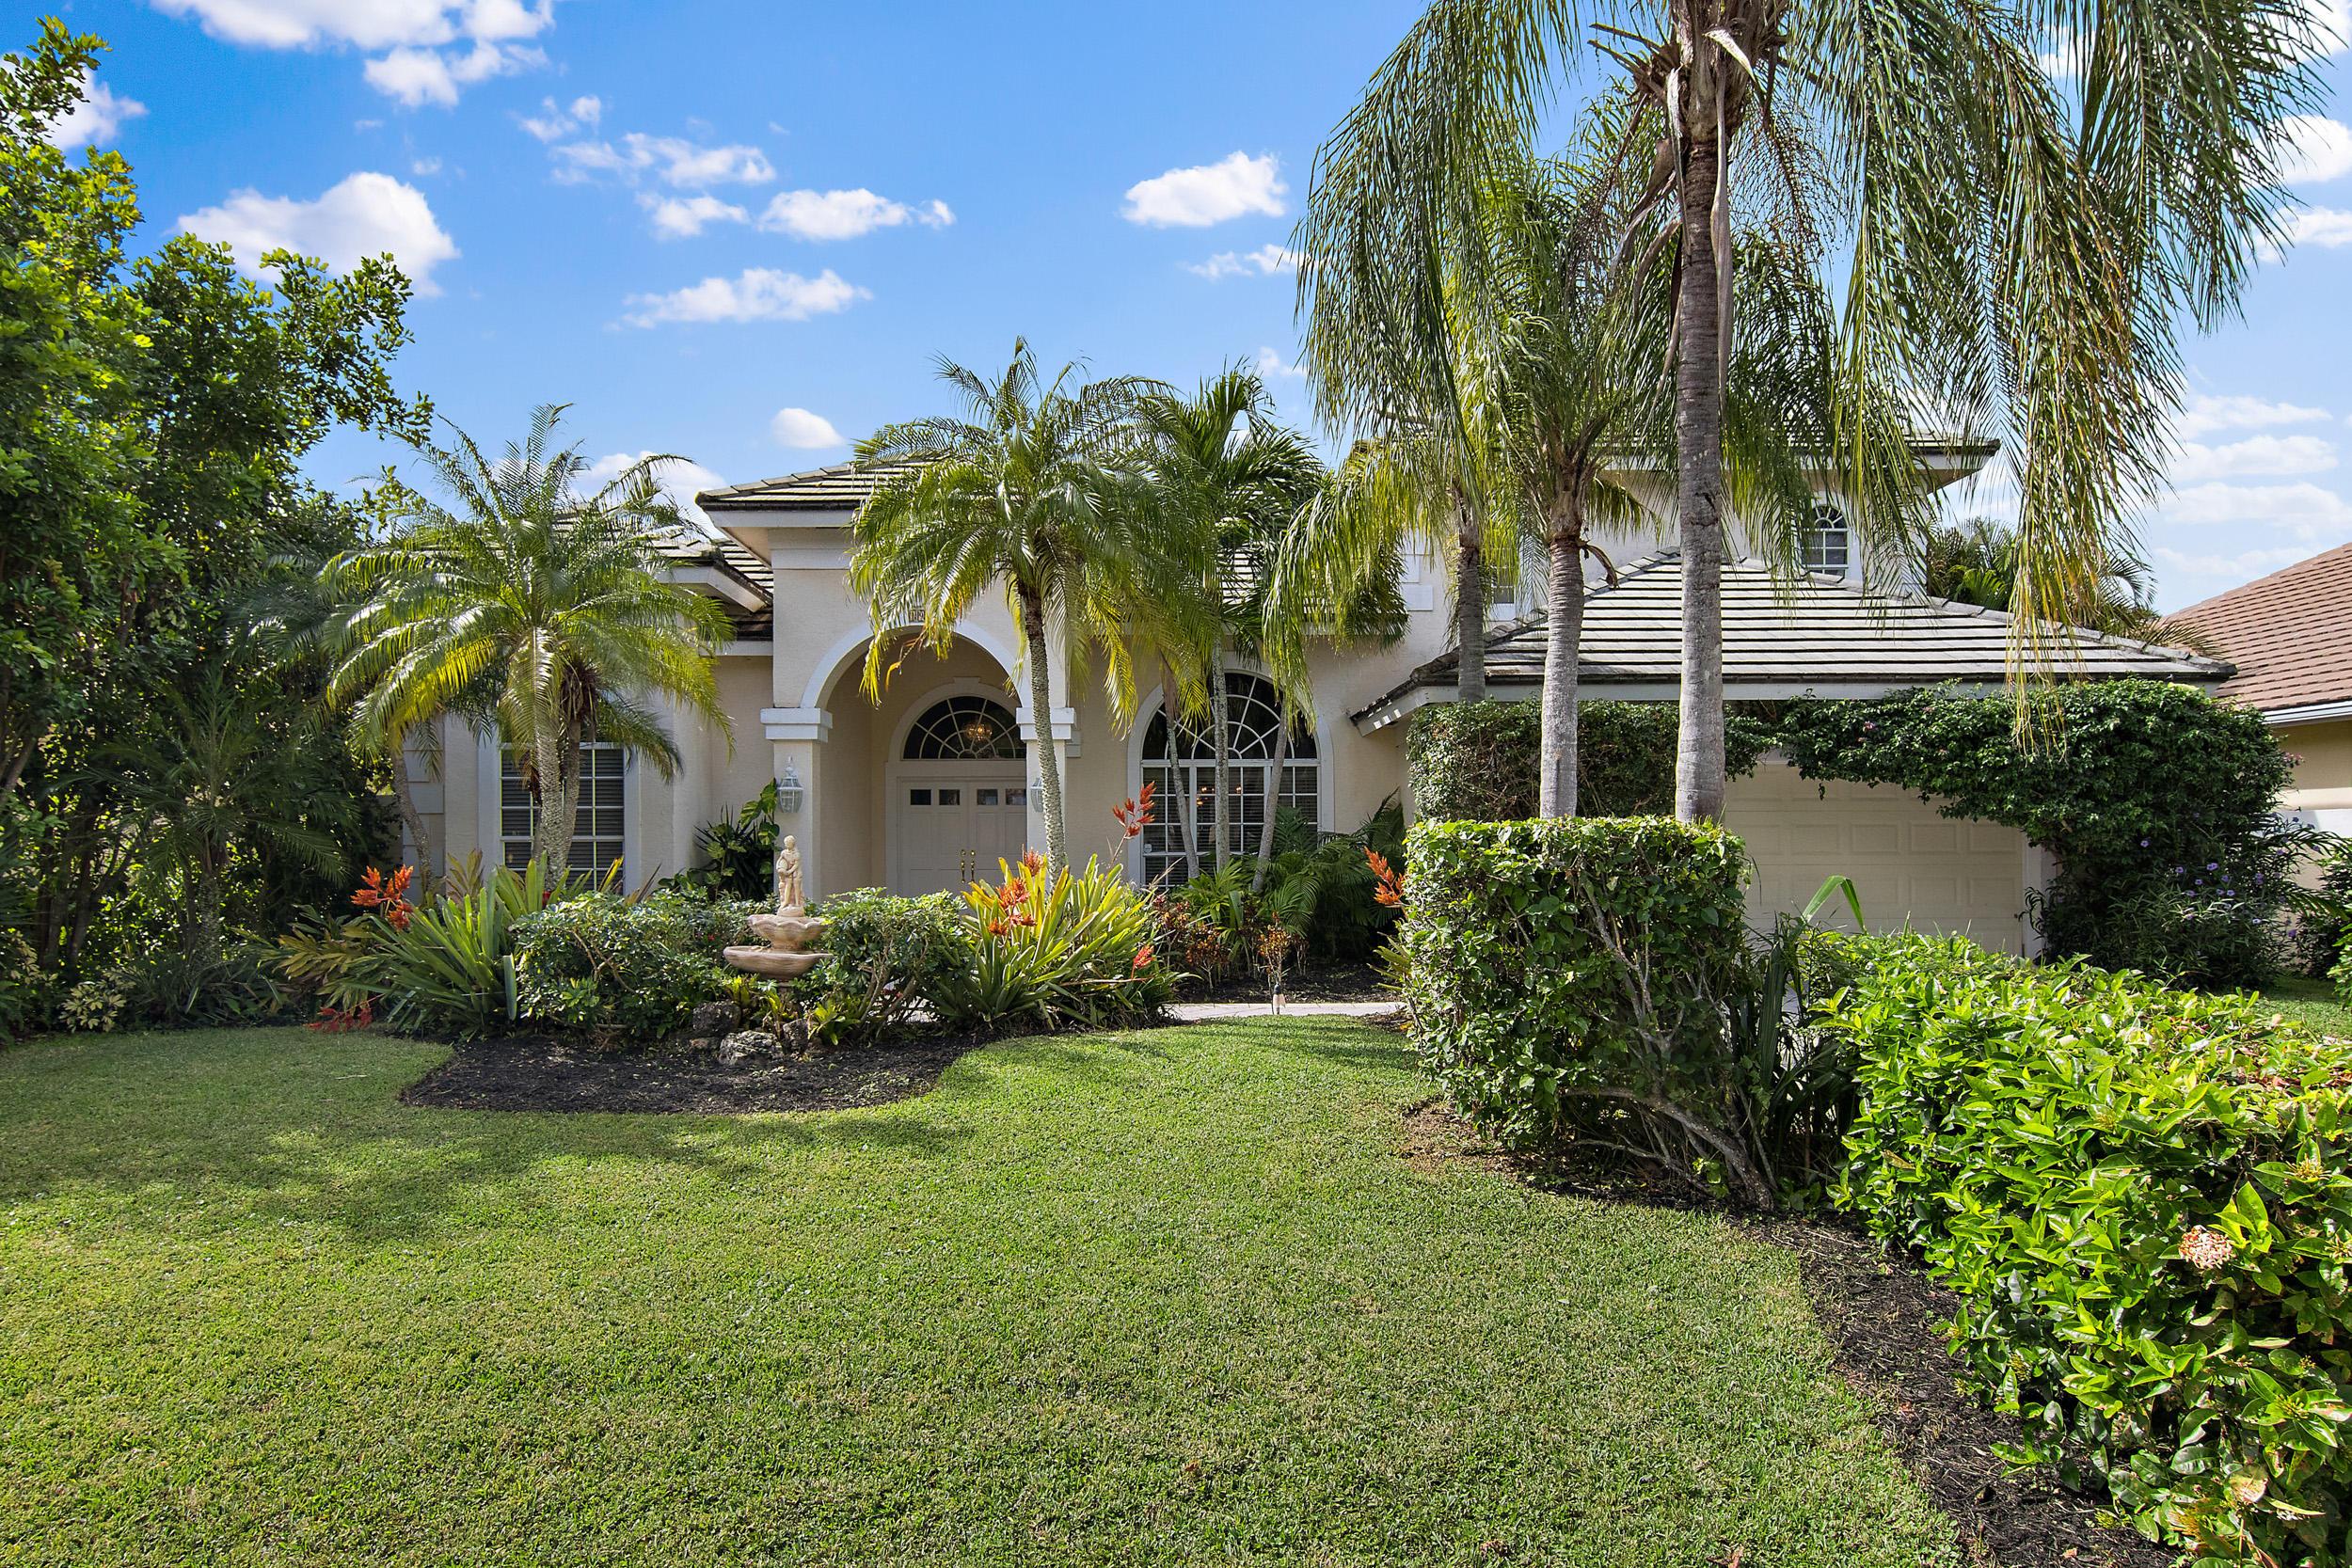 Photo of 19 Windward Isle(s), Palm Beach Gardens, FL 33418